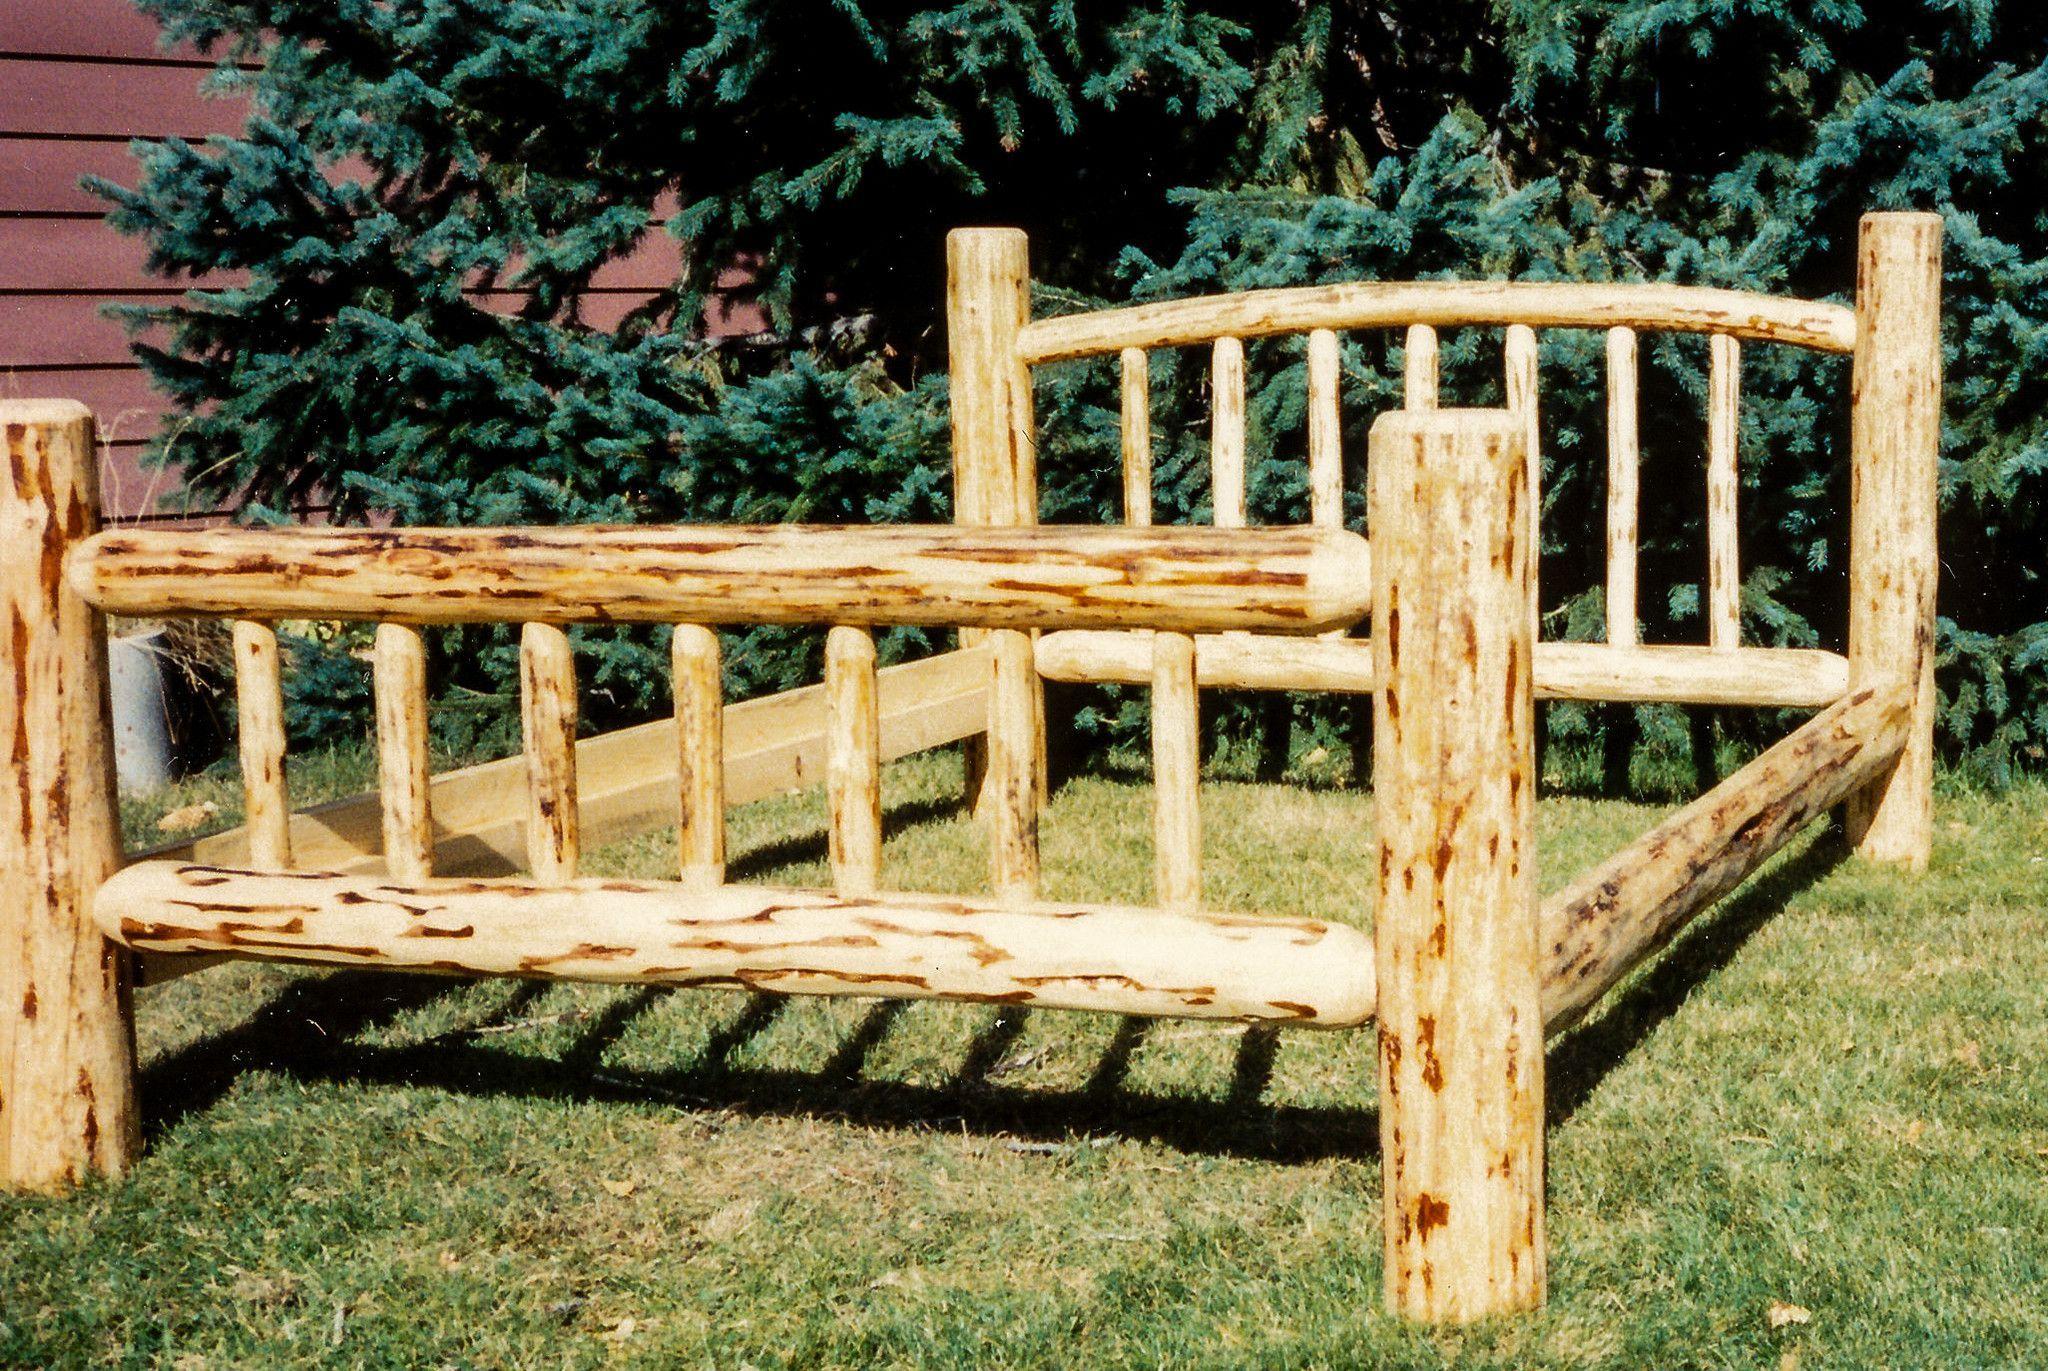 Handmade Lodgepole Pine Log Bed with Curved Headboard